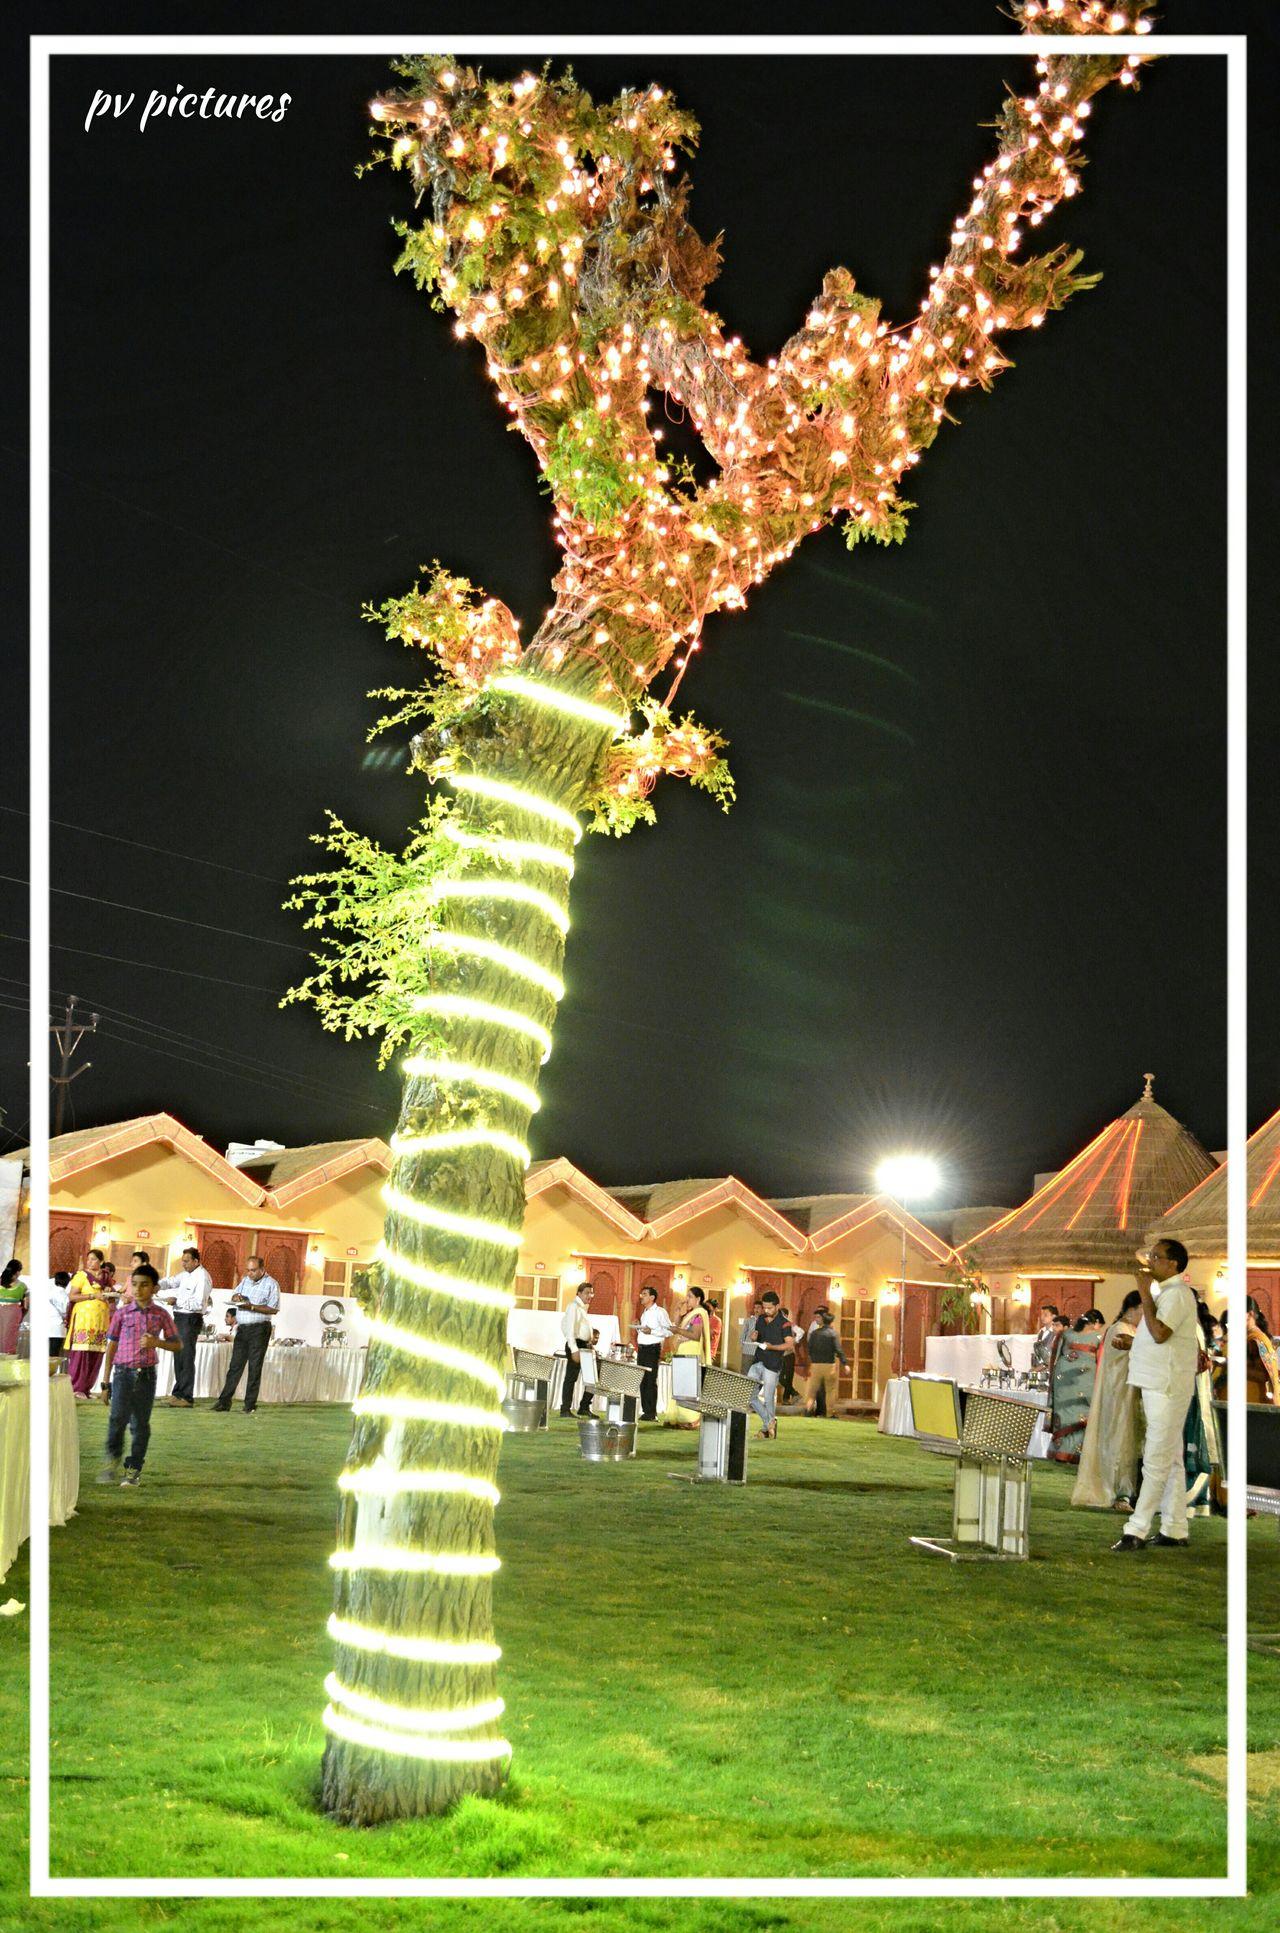 Picspv Rajasthan Tree Bikaner Night Lights Treelight